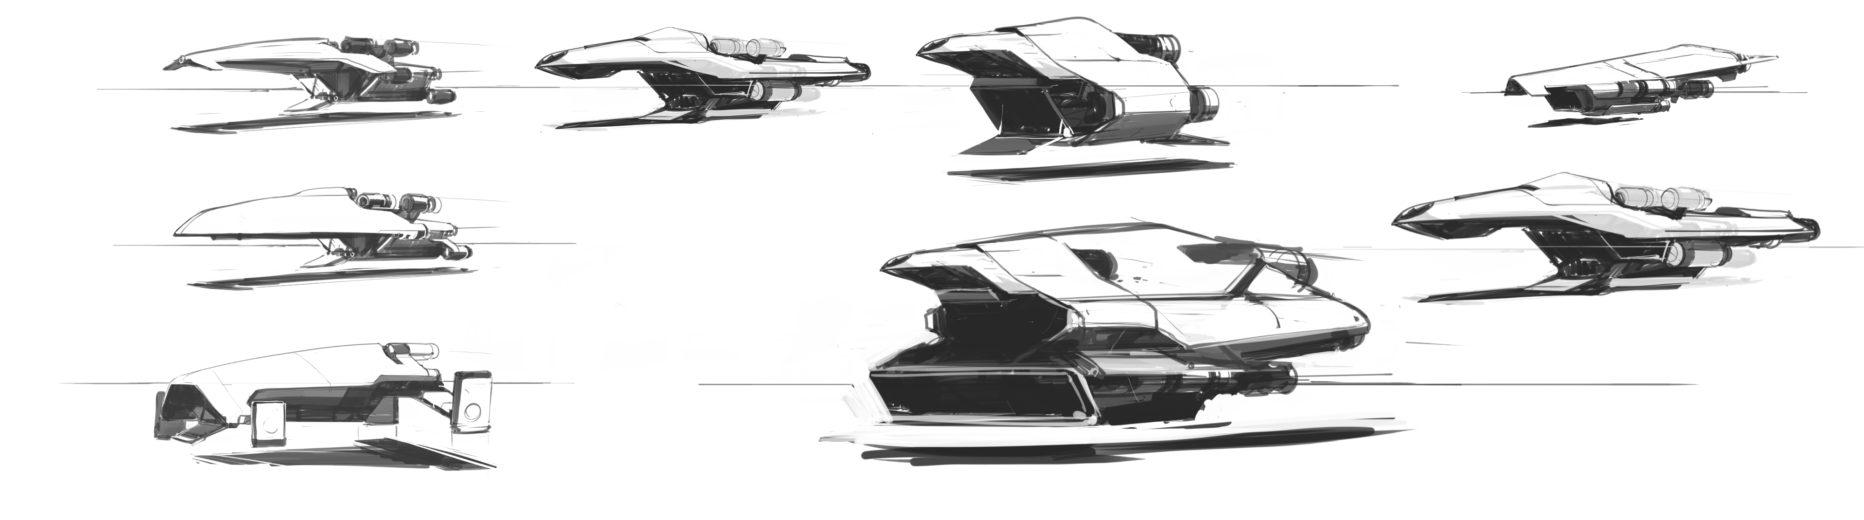 SC-Hercules-Concept-Art-8.jpg